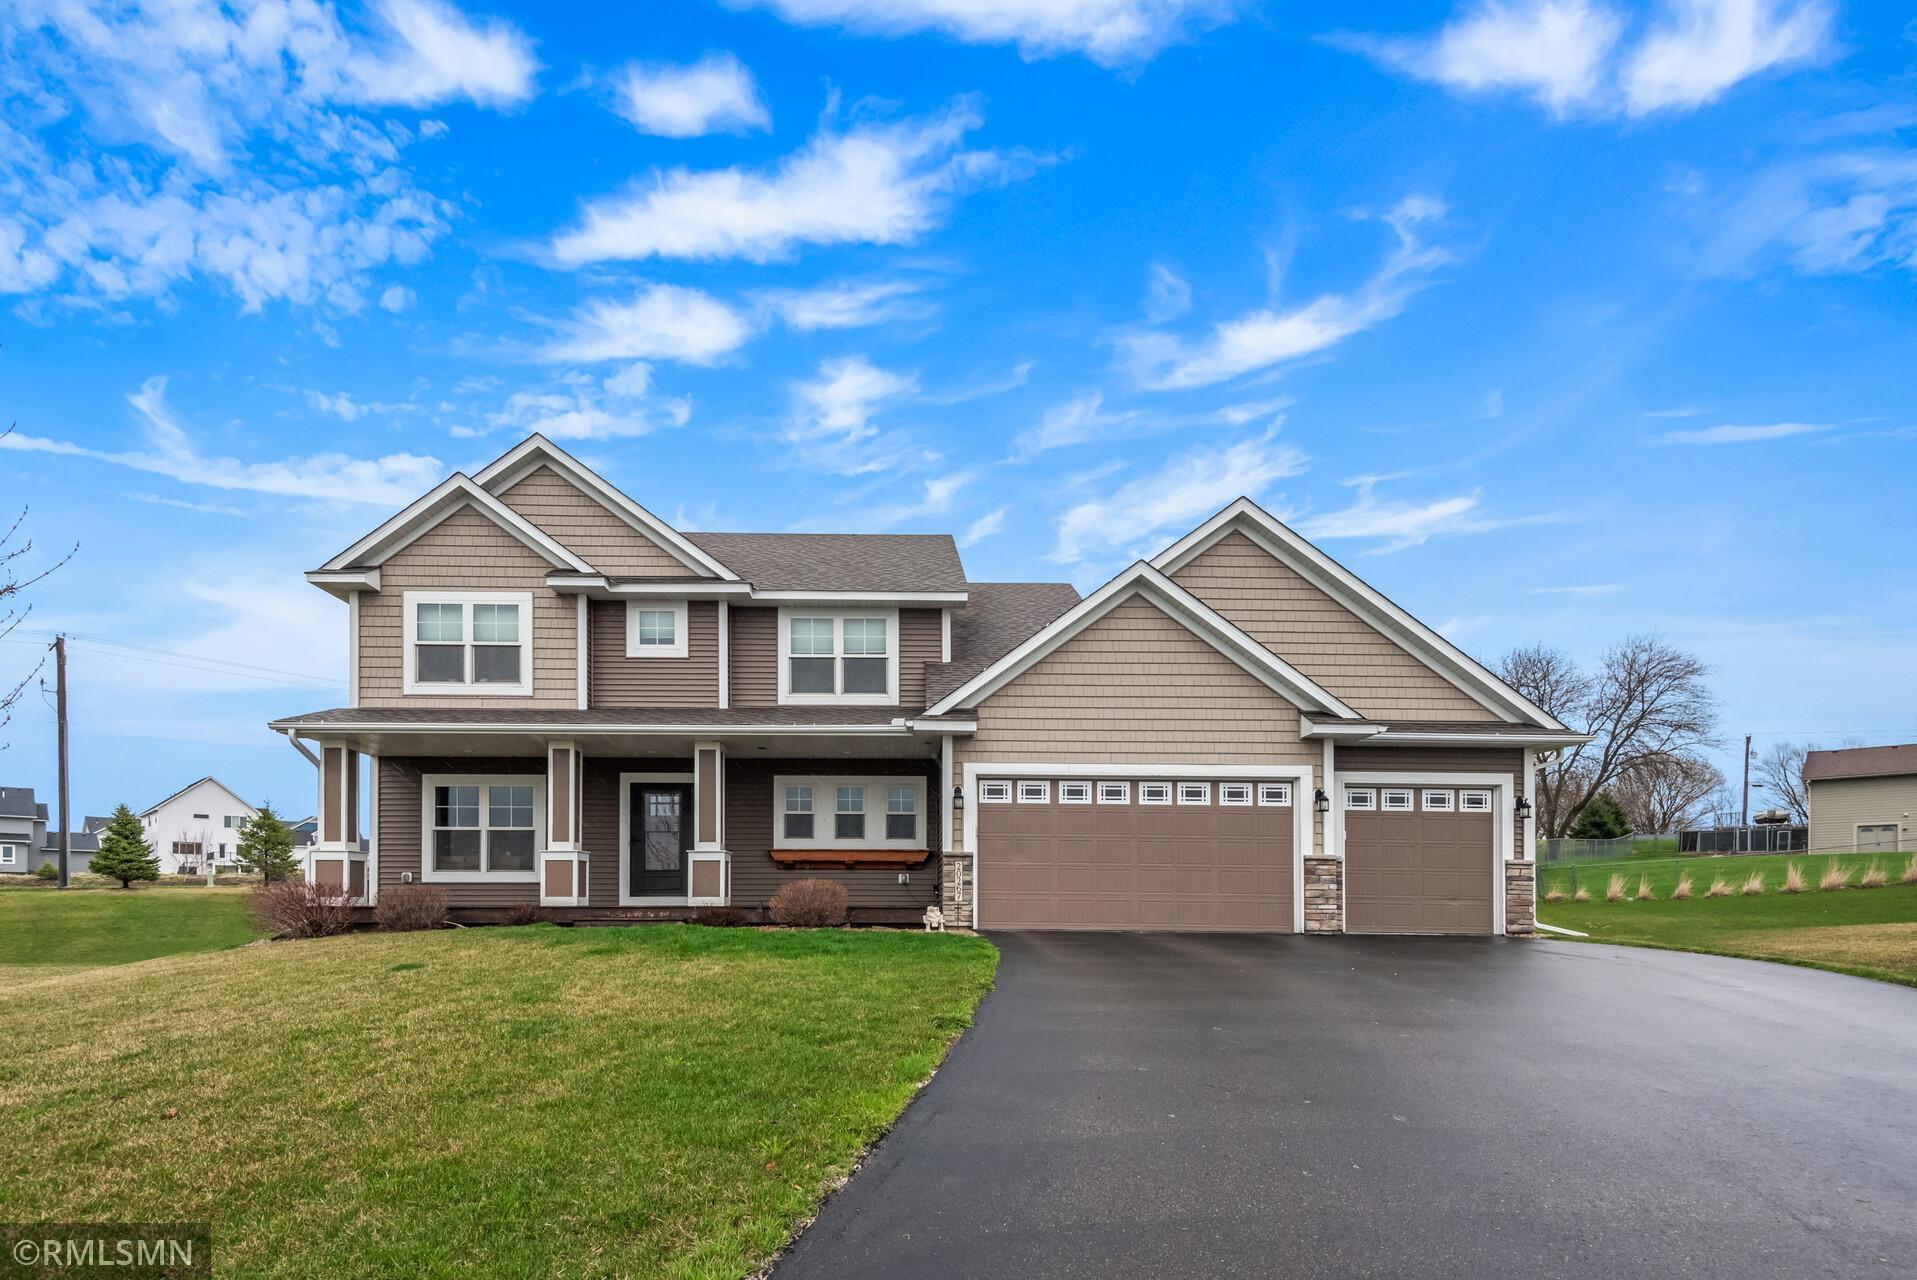 20267 Hampton Circle, Lakeville MN 55044 - Photo 1